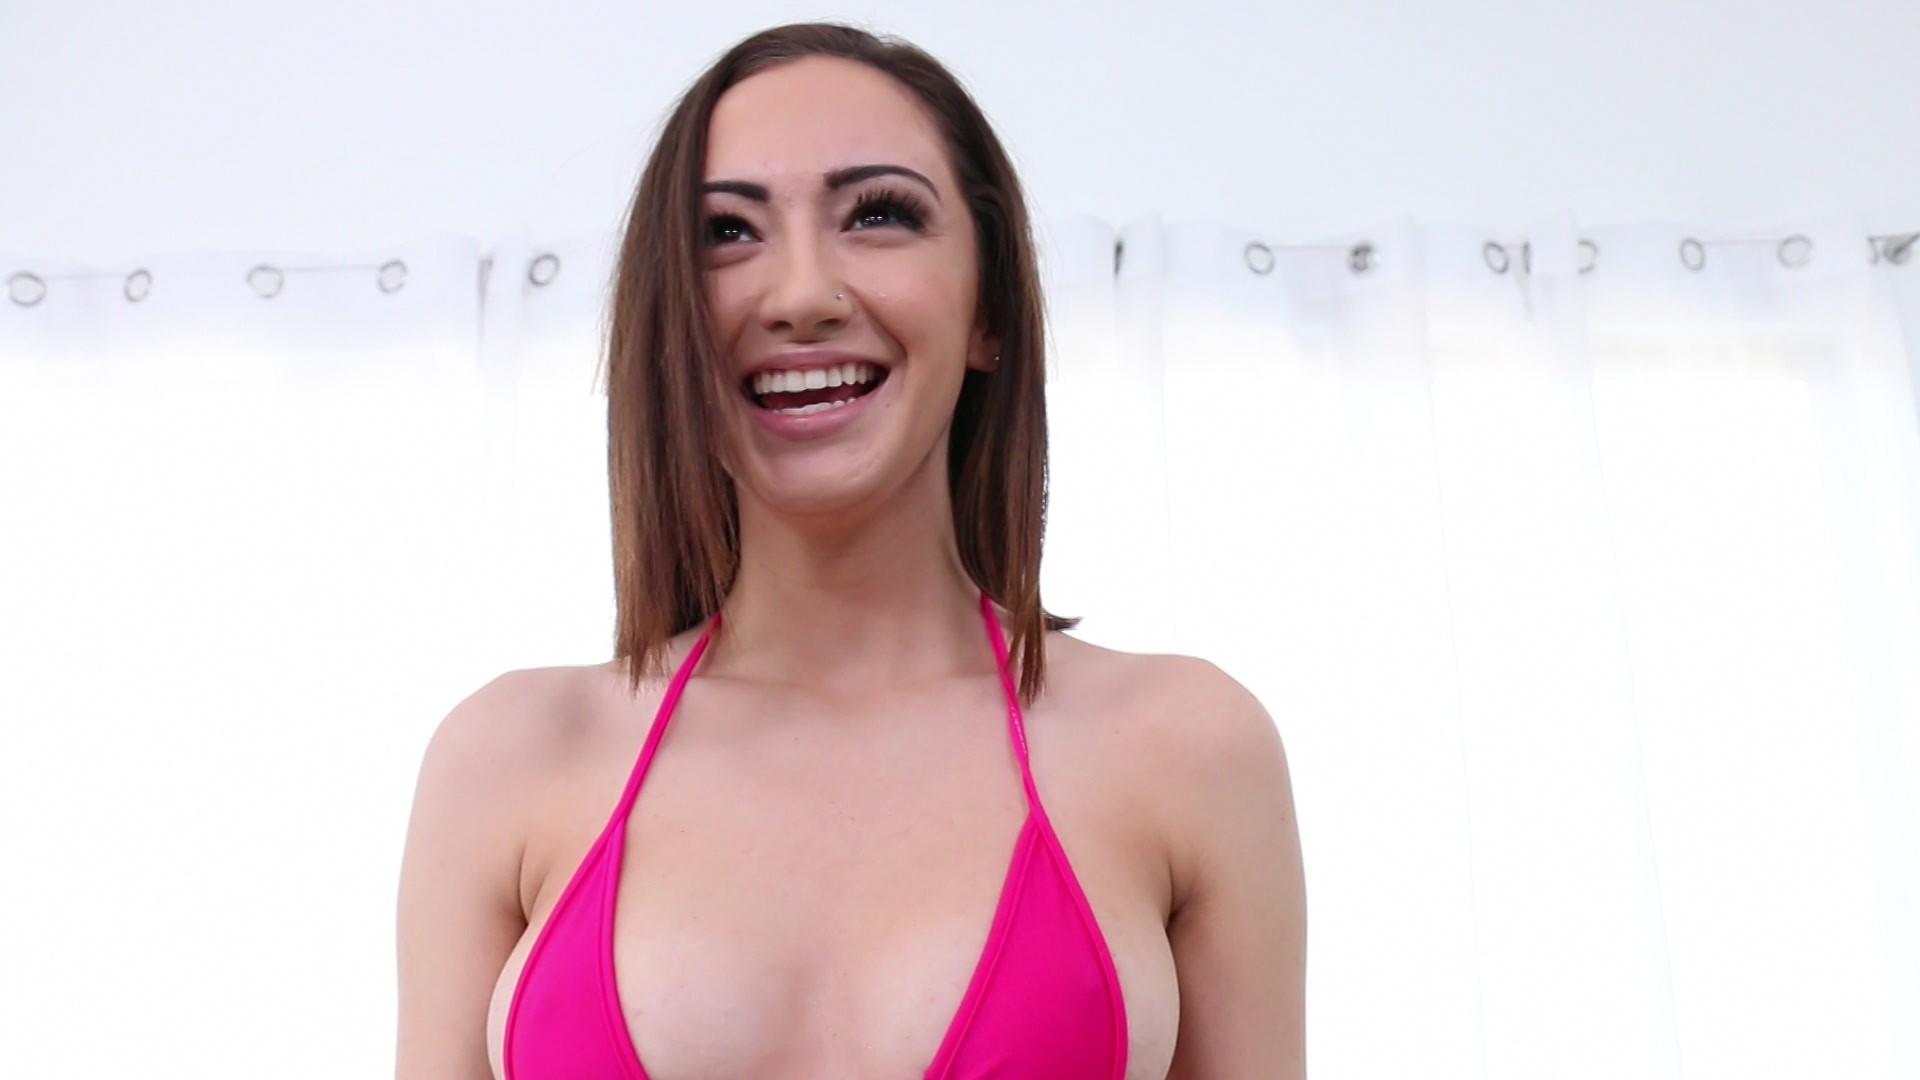 brand new porn videos